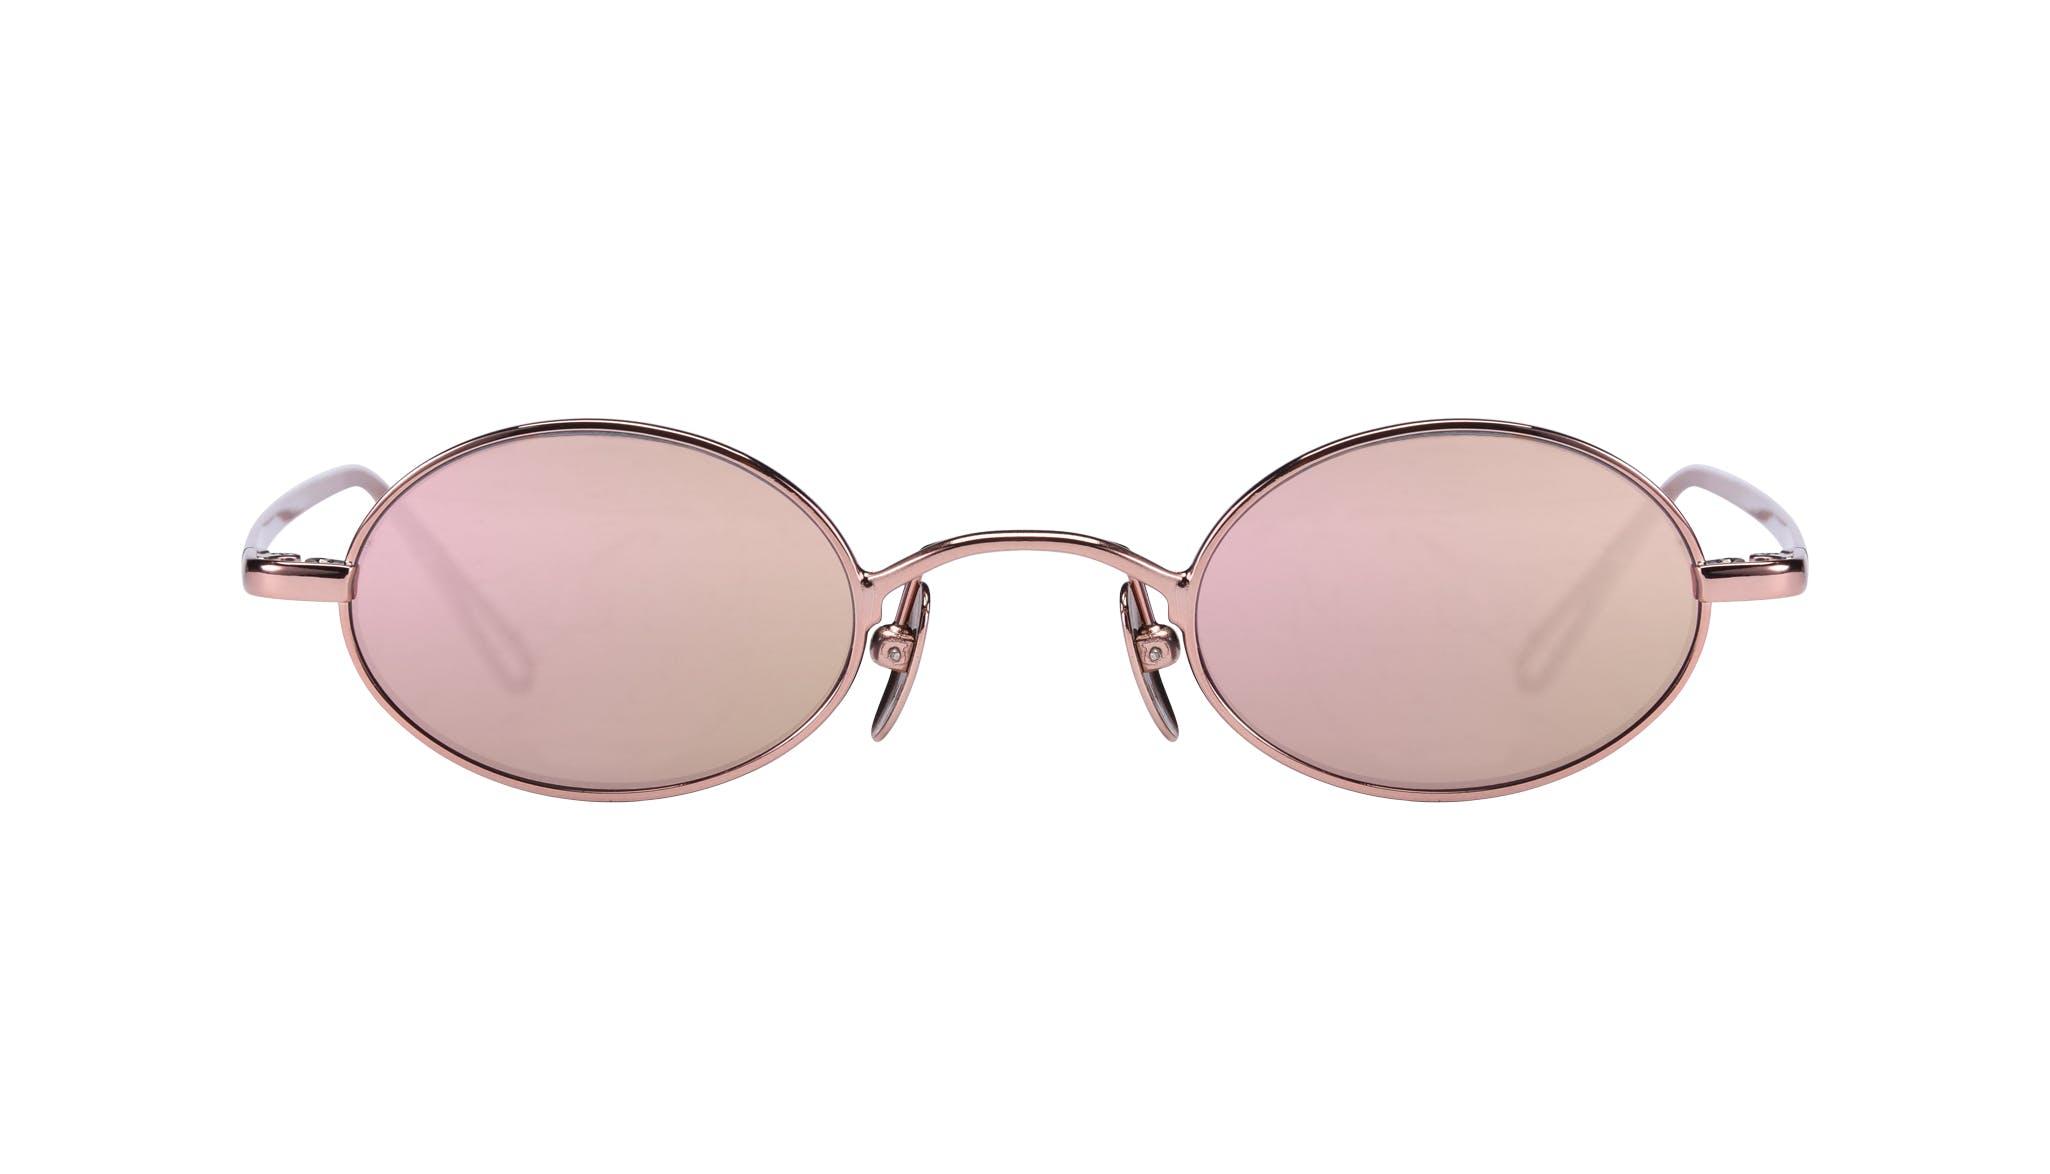 Affordable Fashion Glasses Round Sunglasses Women Stellar Rose Gold